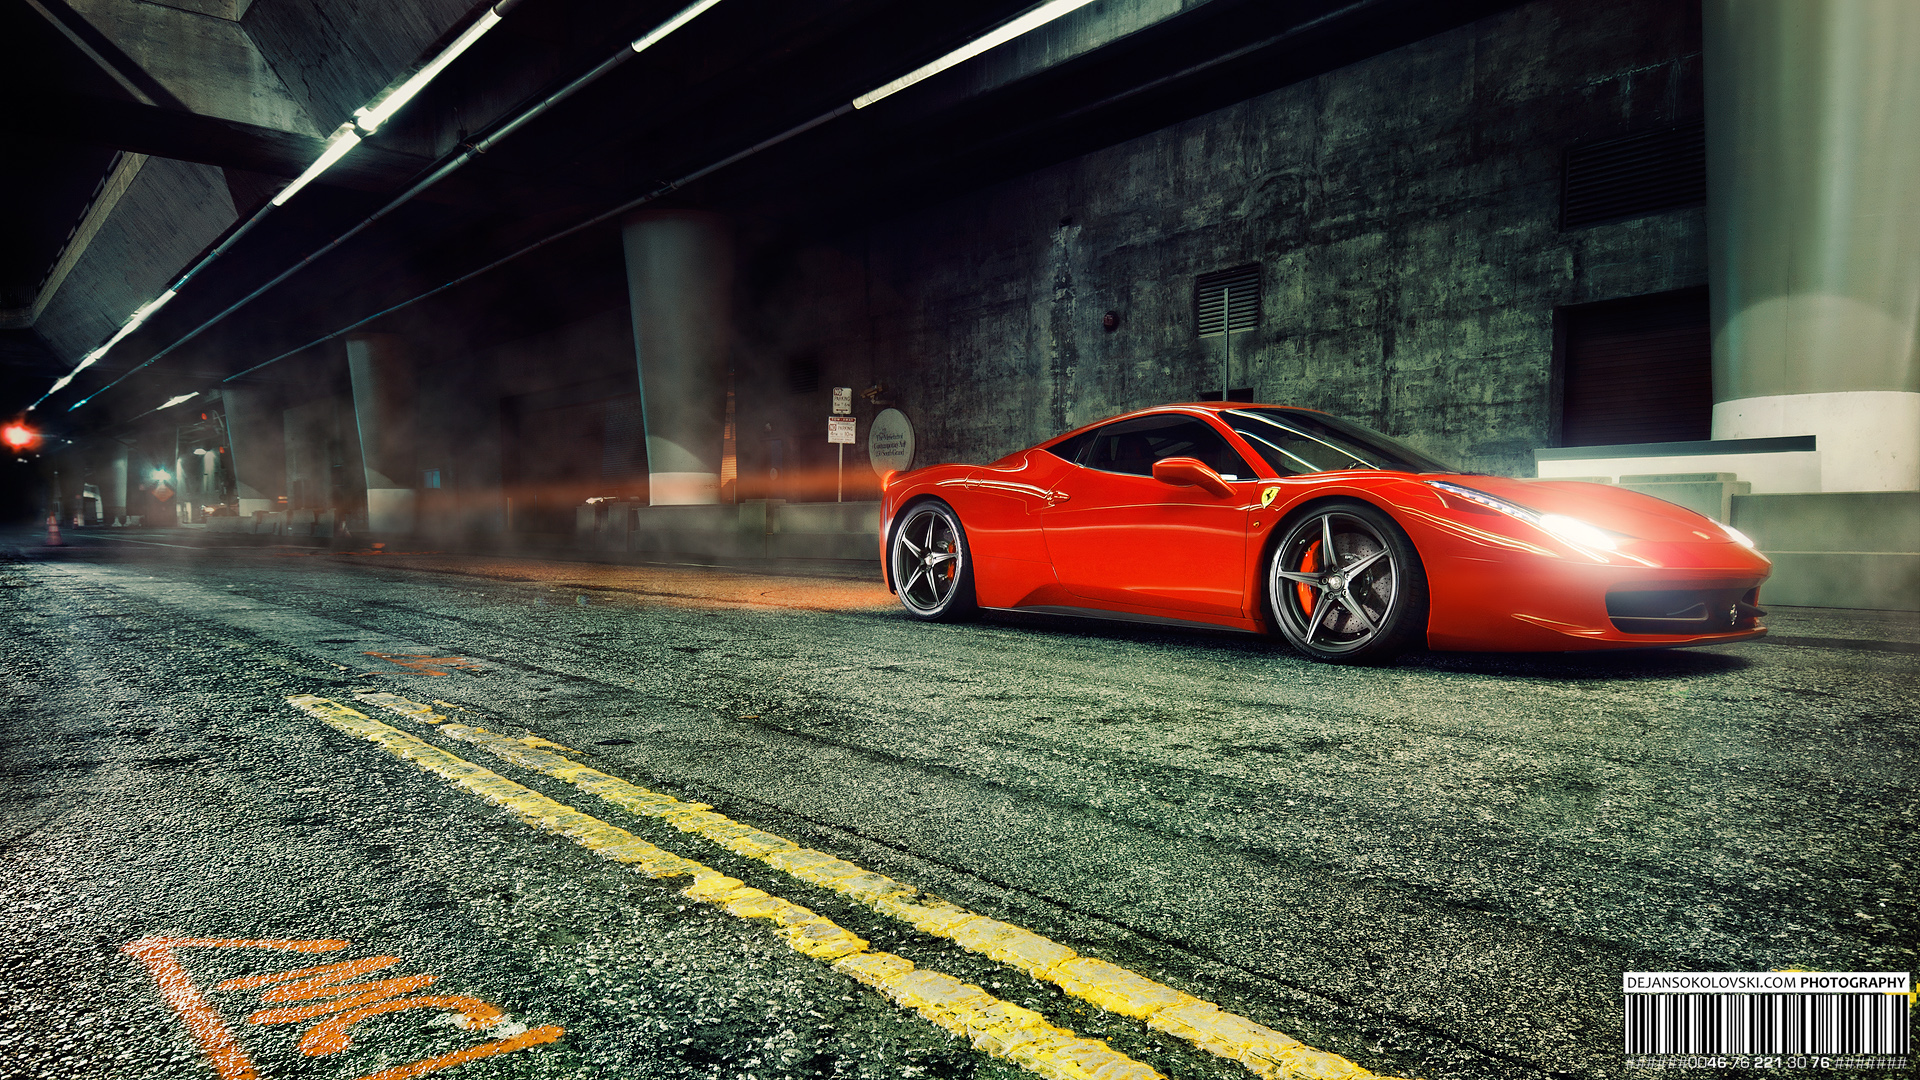 Ferrari F458 HD World Cars Wallpaper For Iphone